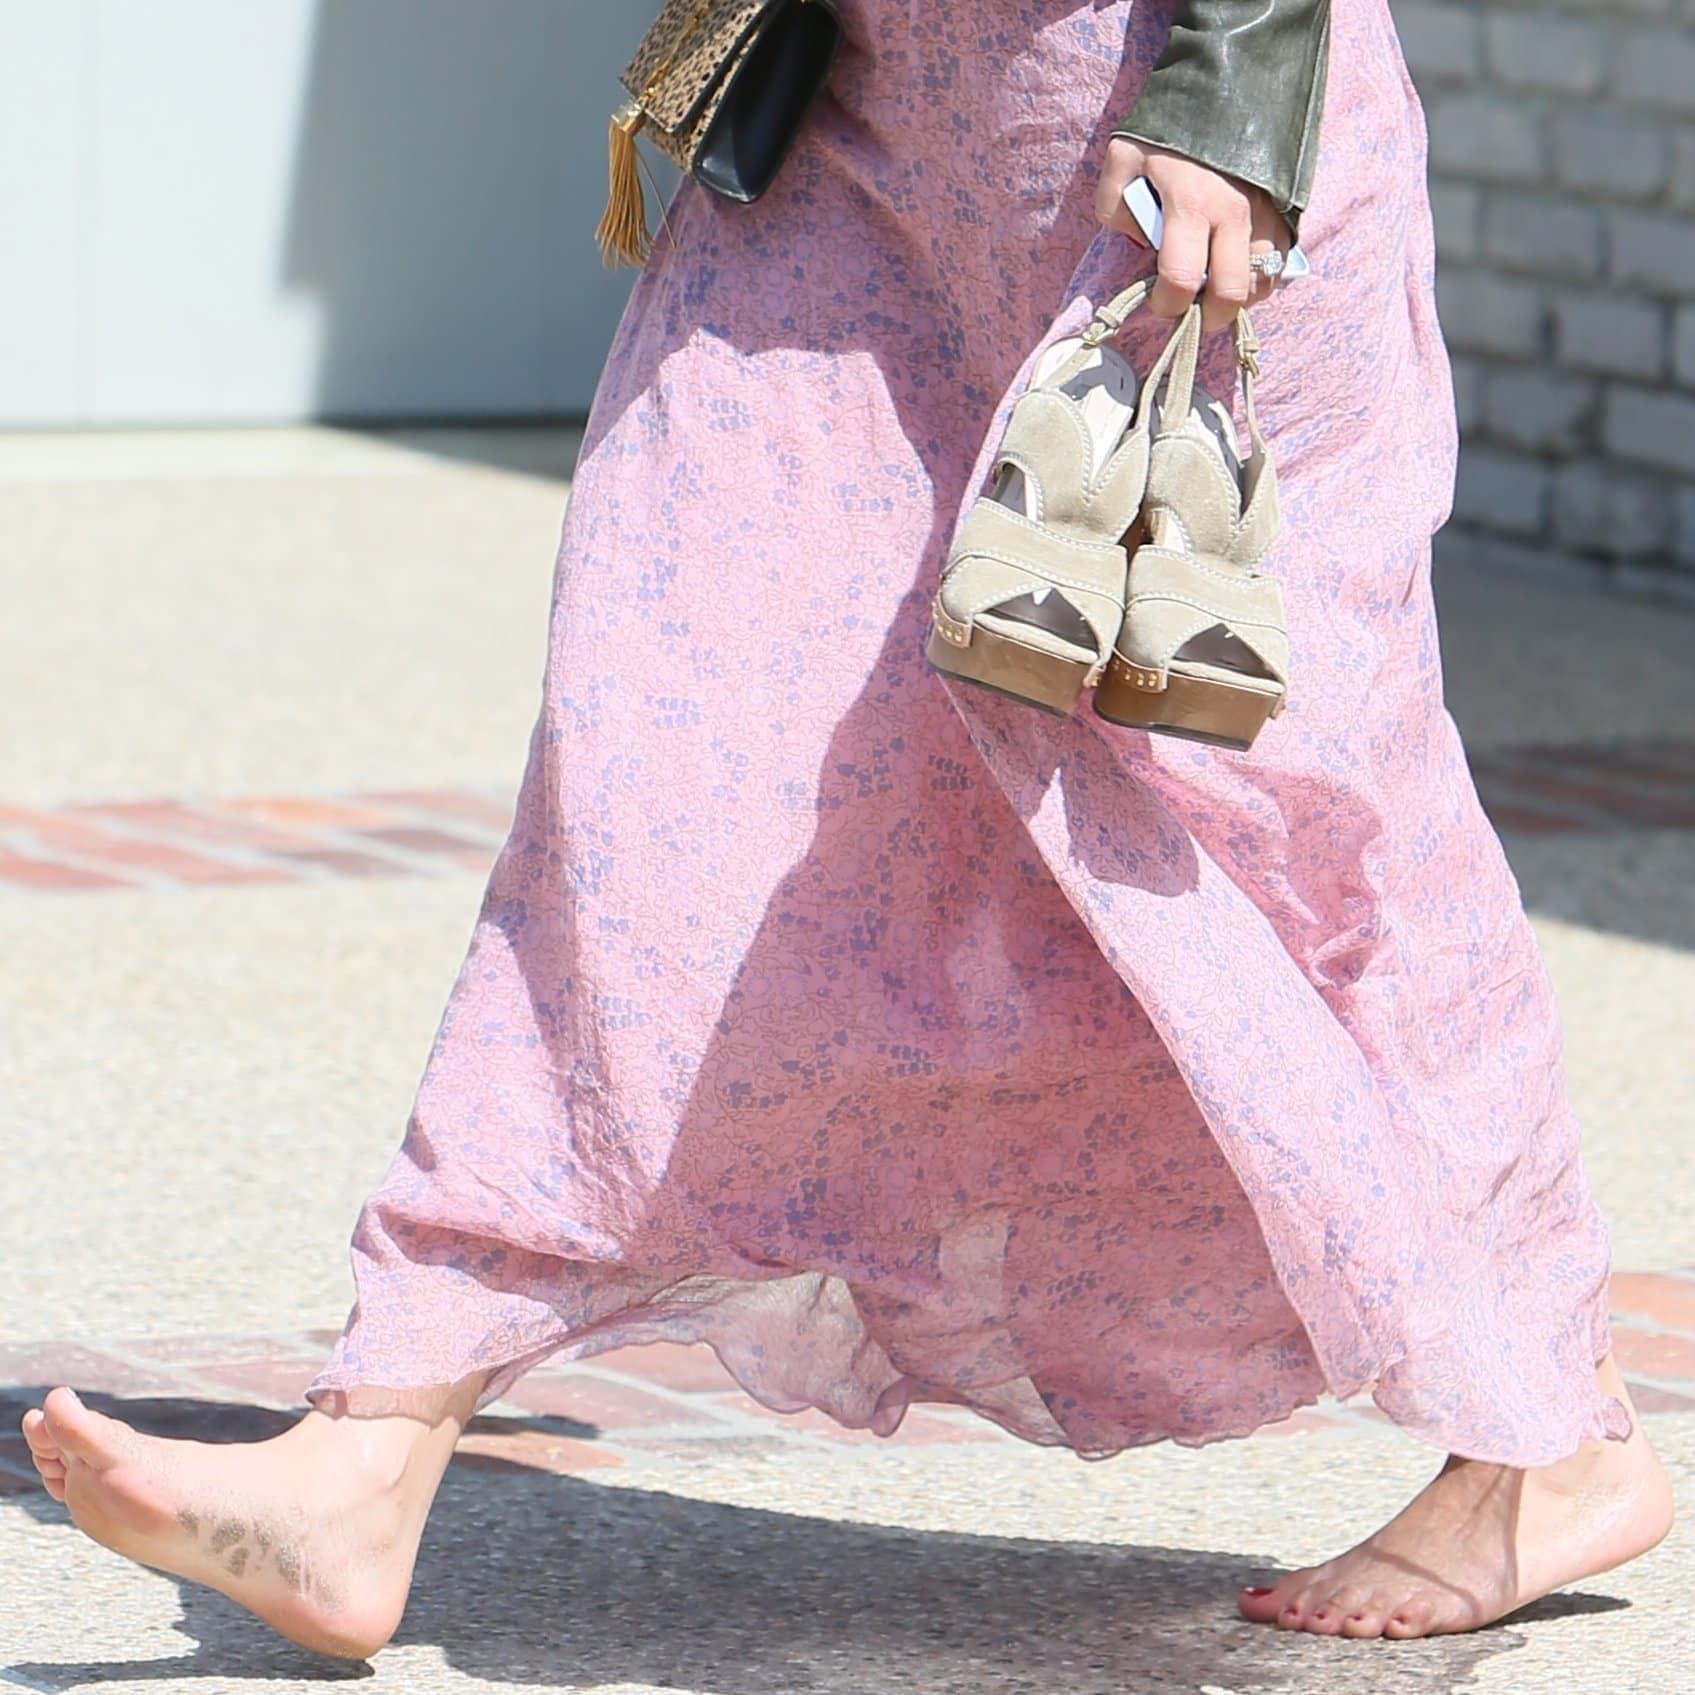 Barefoot Kaley Cuoco wears shoe size 9 (US)